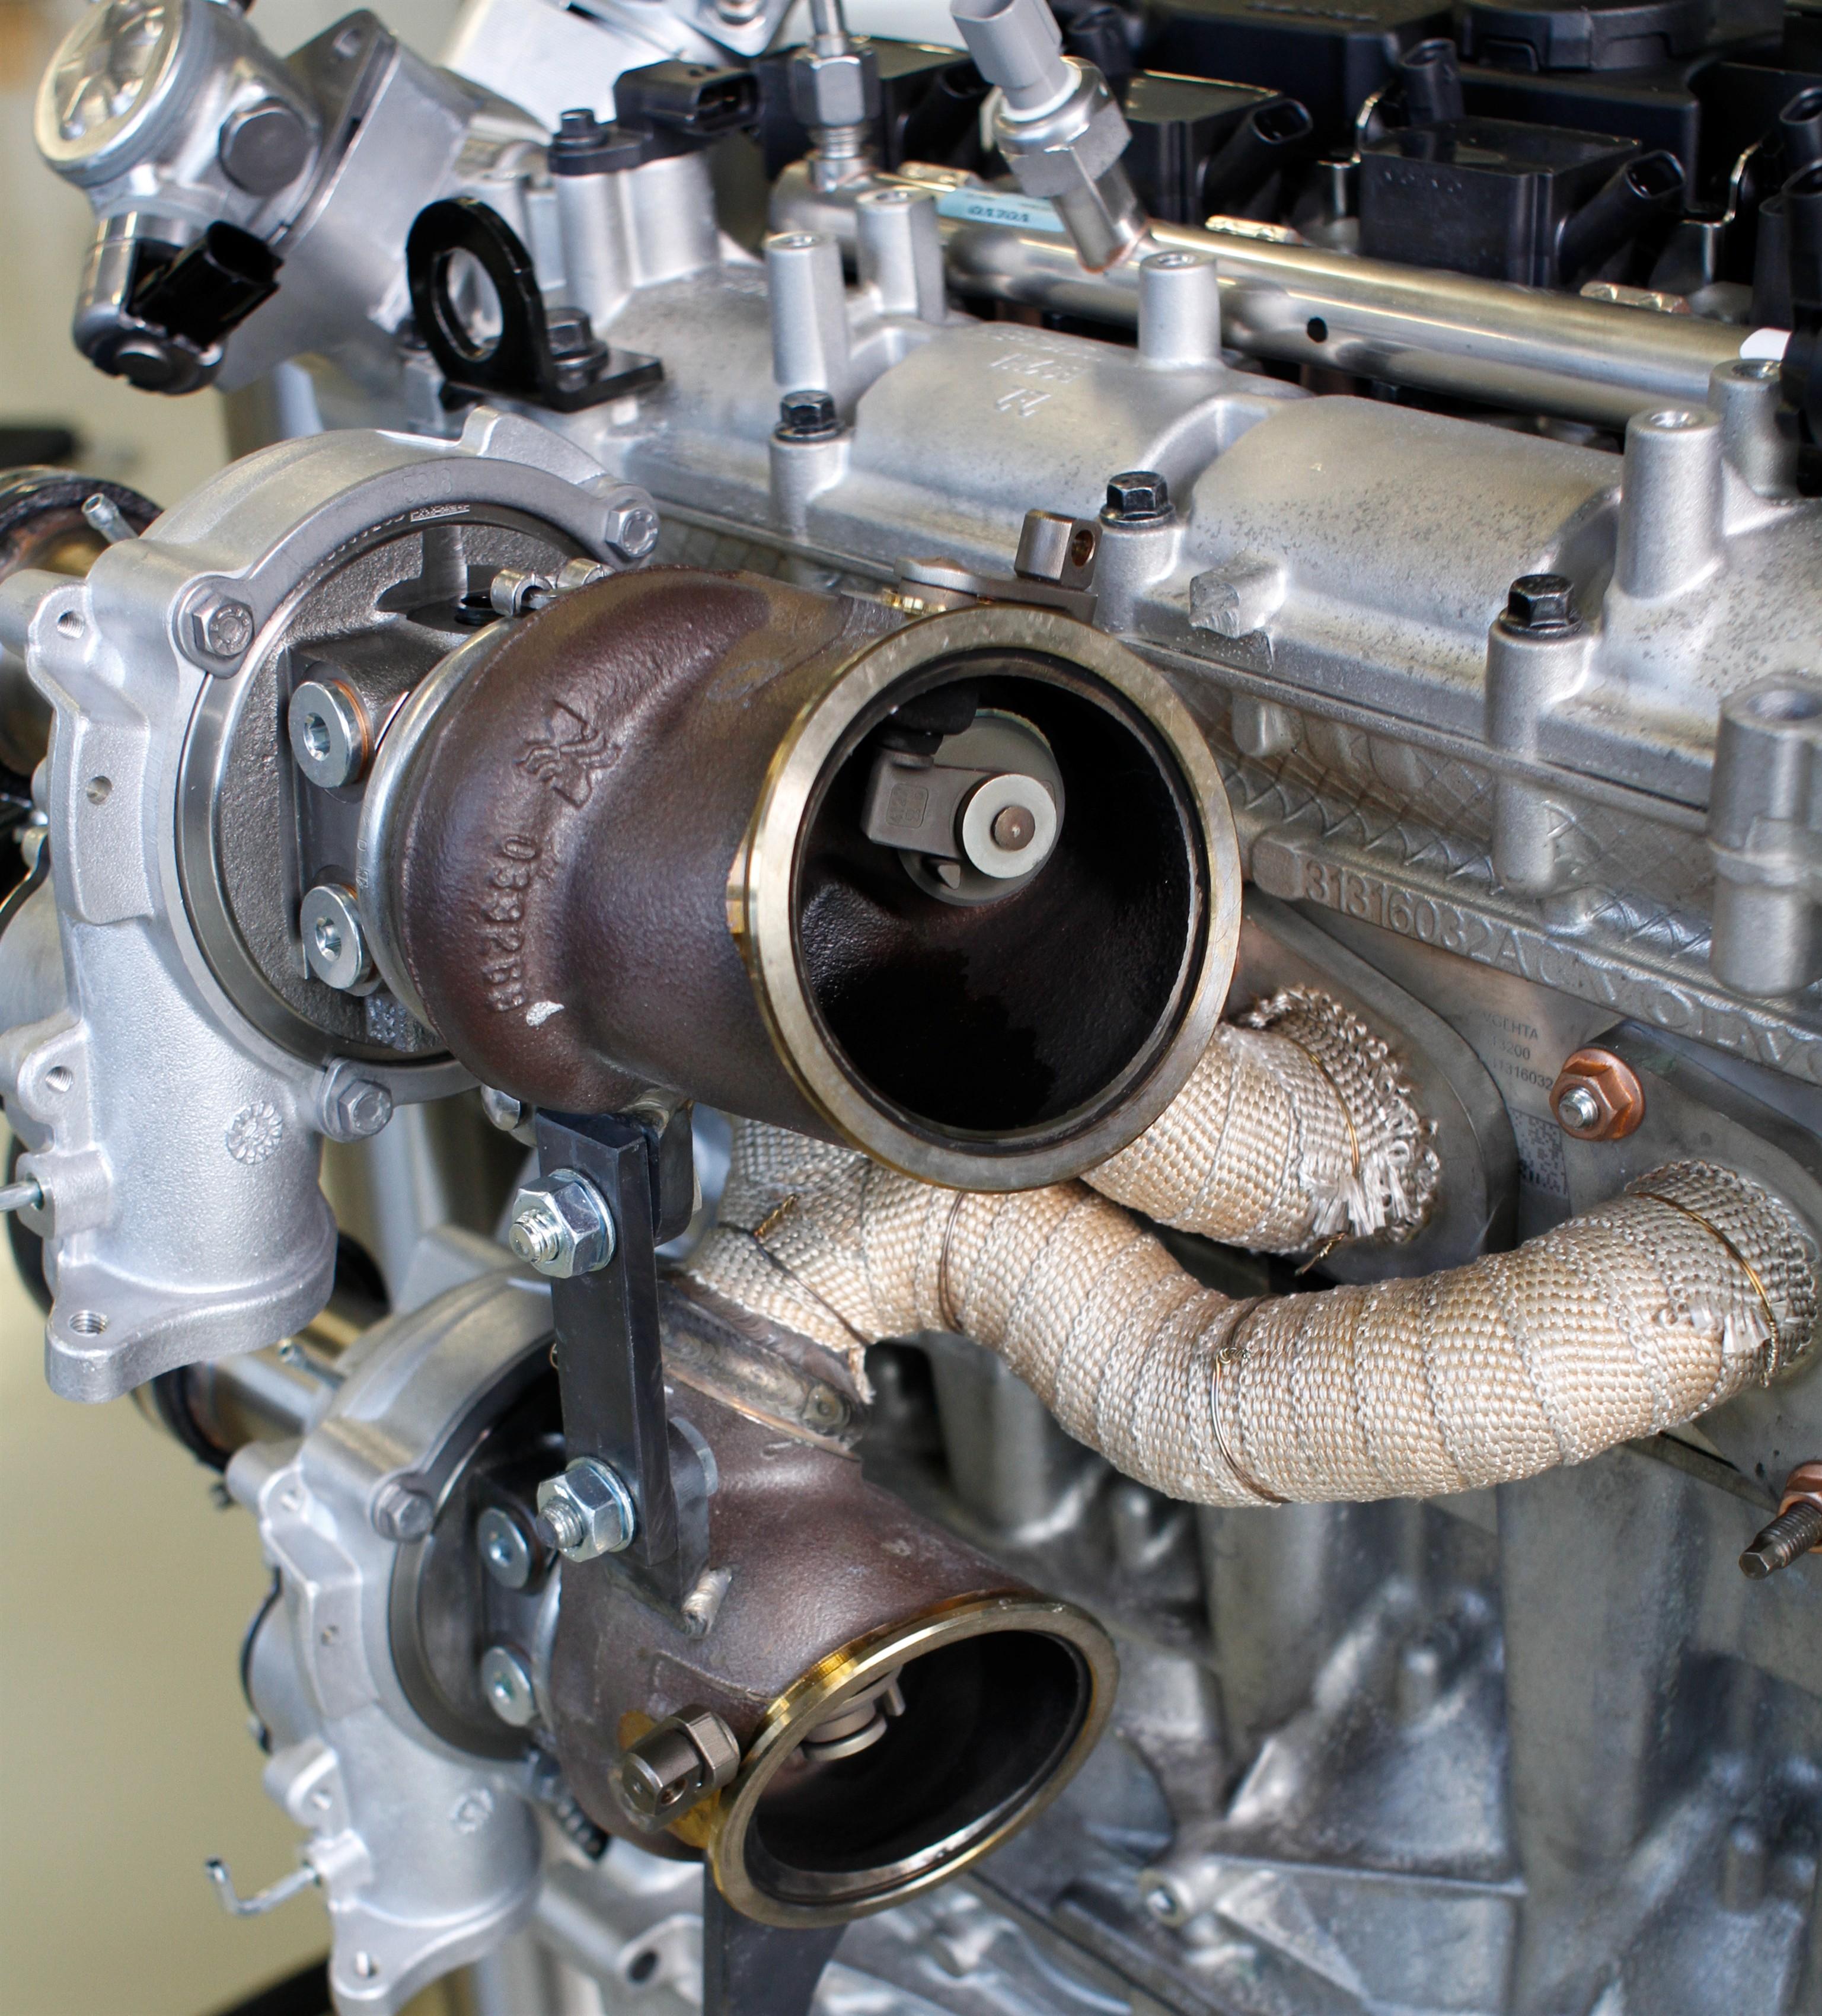 Alfa romeo 159 exhaust system